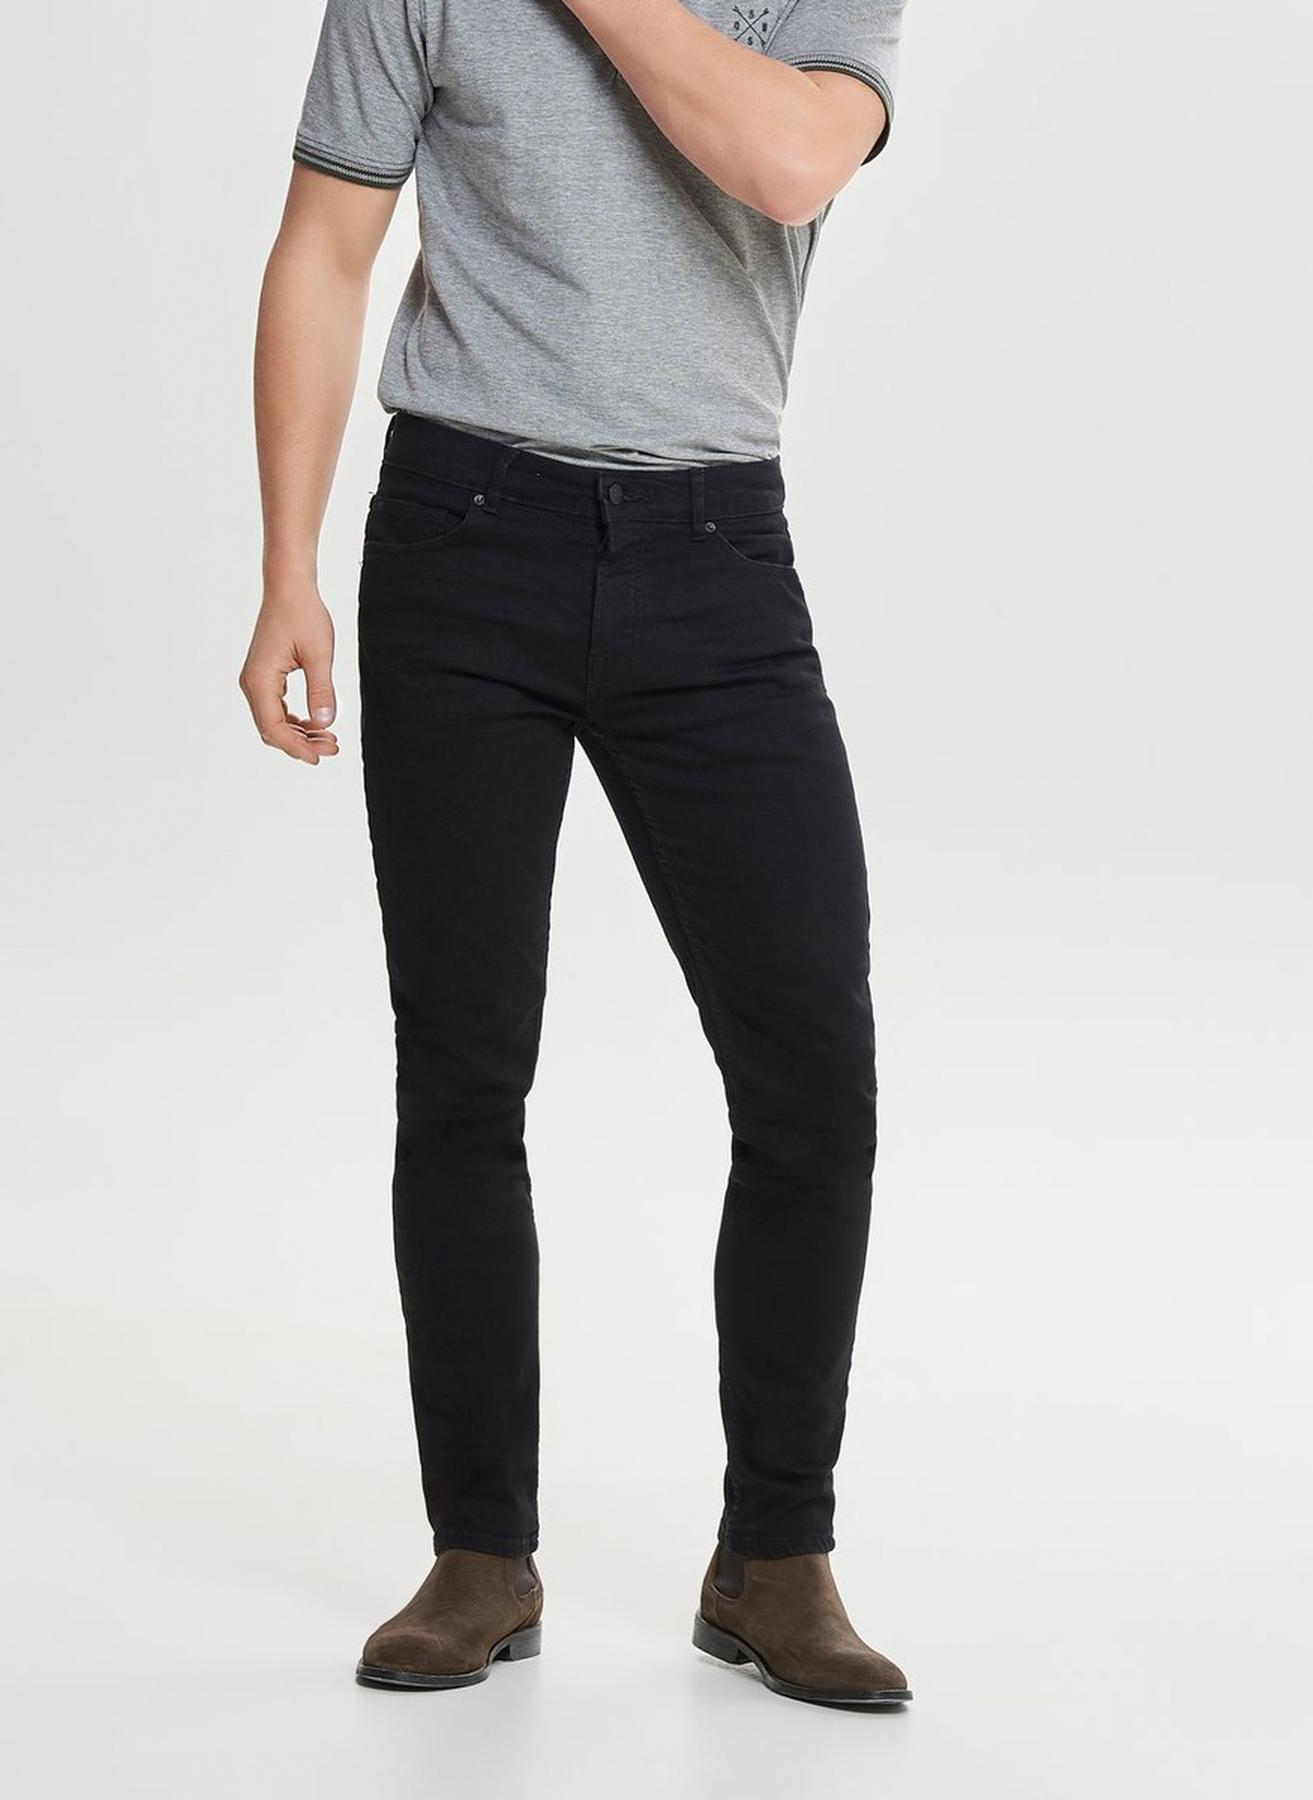 Only & Sons Siyah Denim Pantolon 28-30 5002326722001 Ürün Resmi